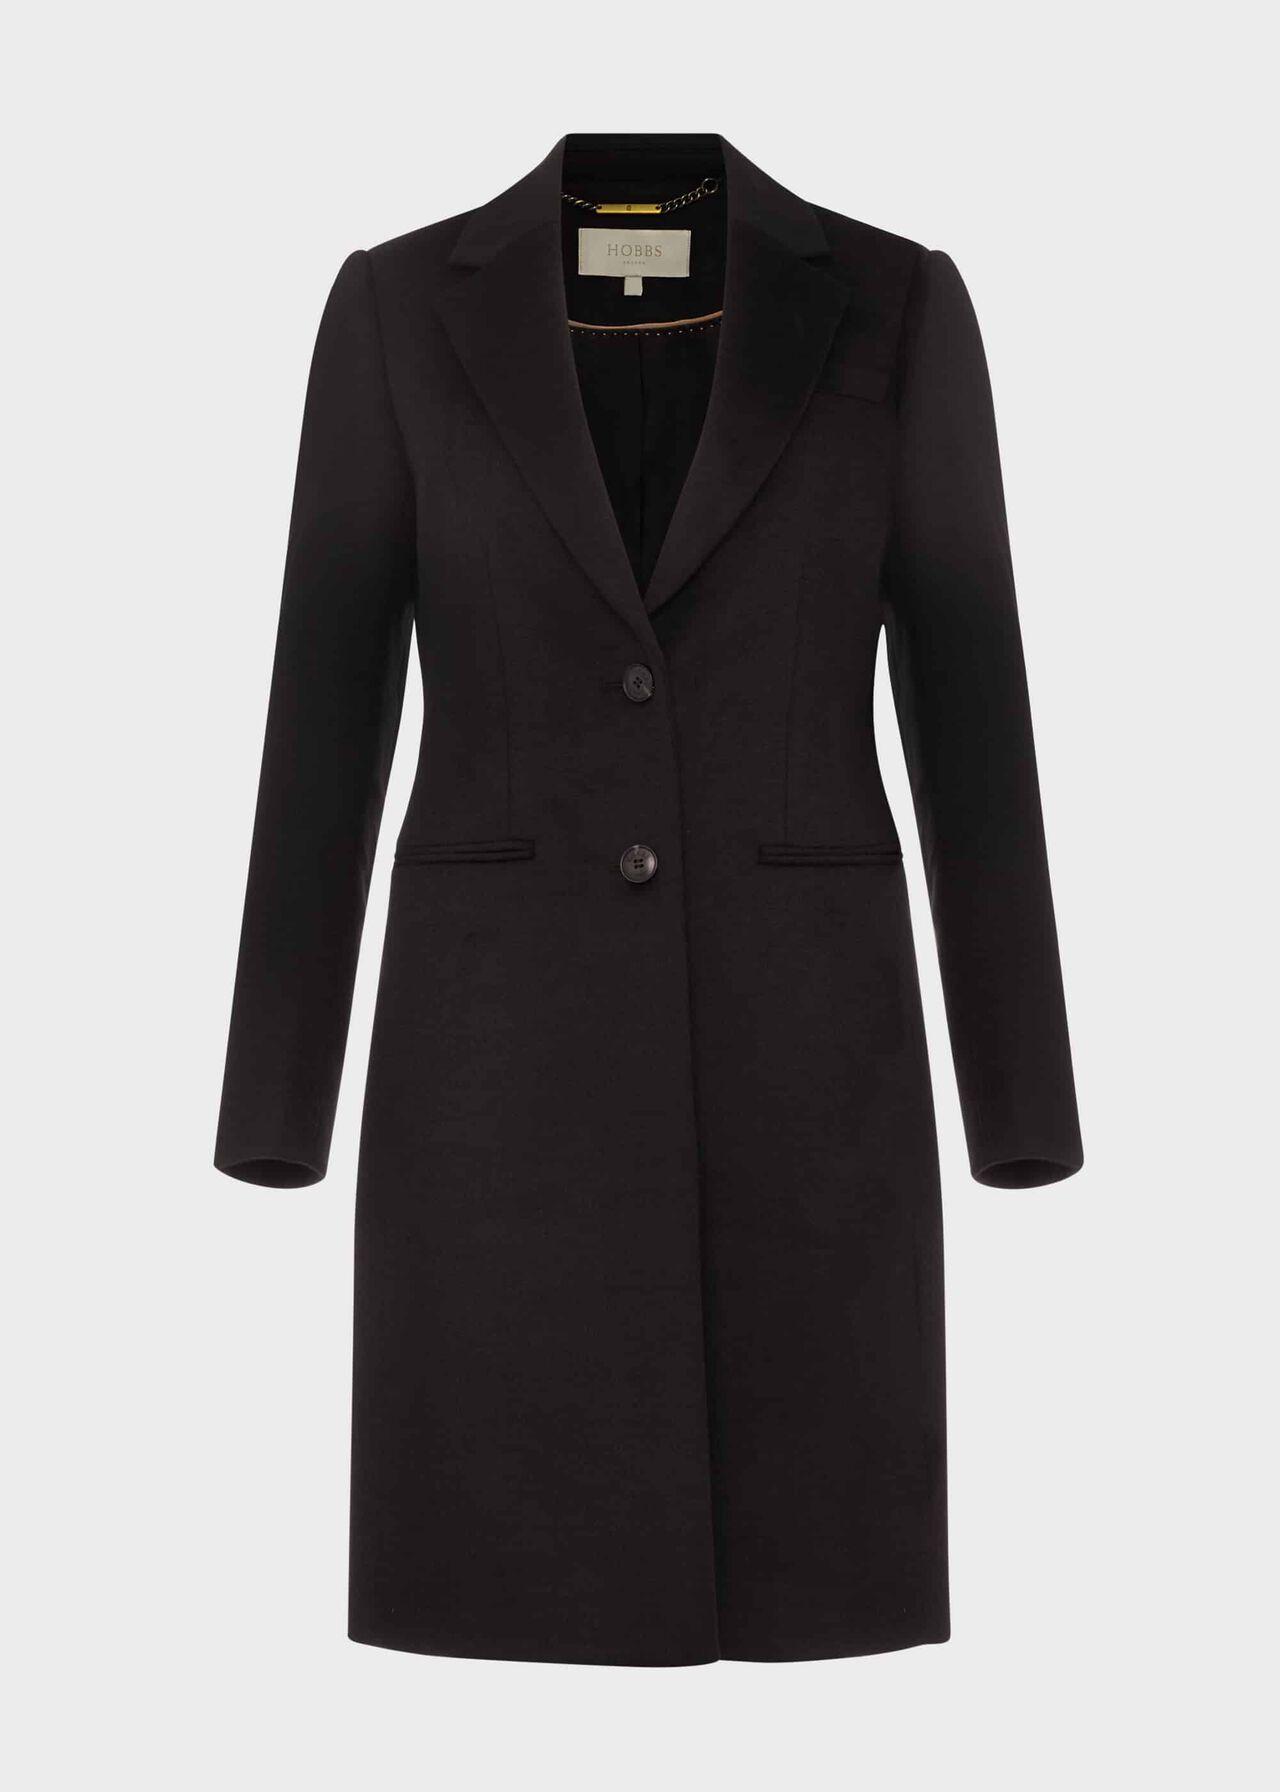 Petite Tilda Wool Coat Black